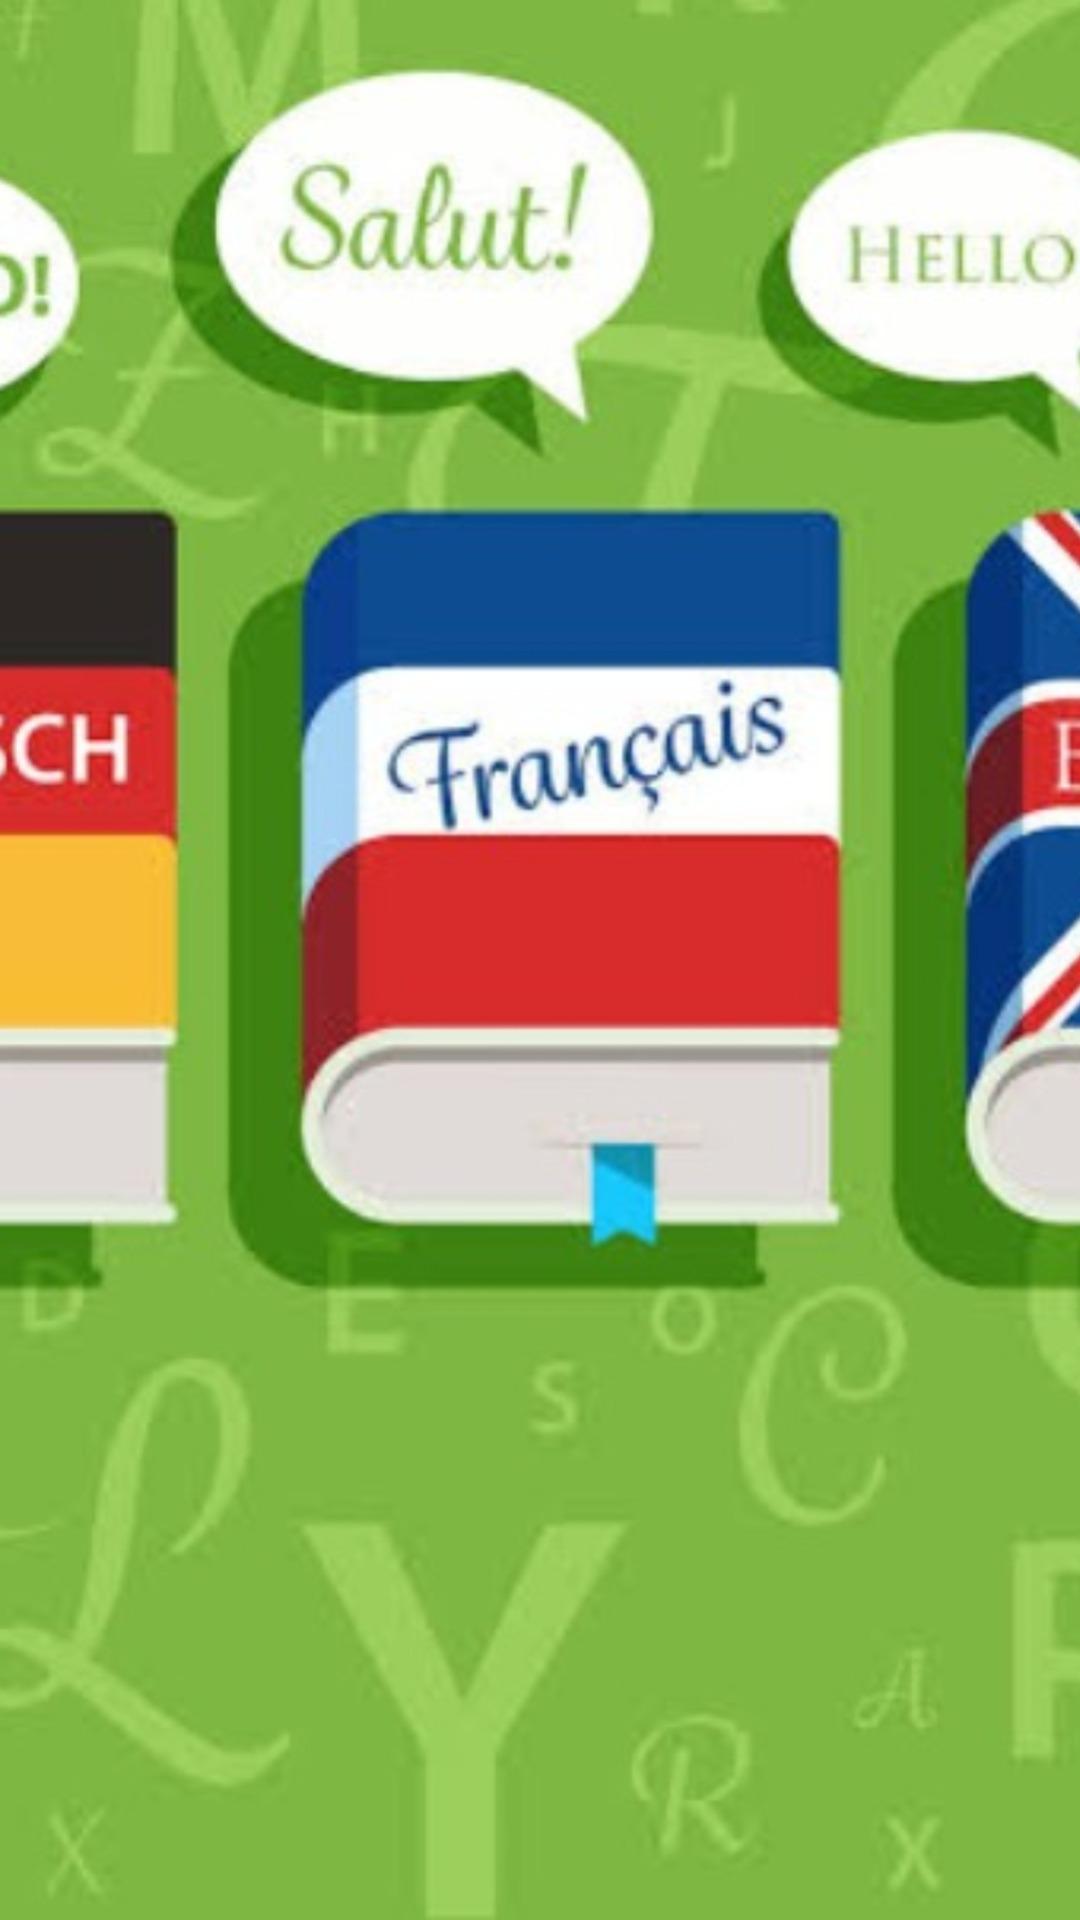 Professional translator of German/French/English